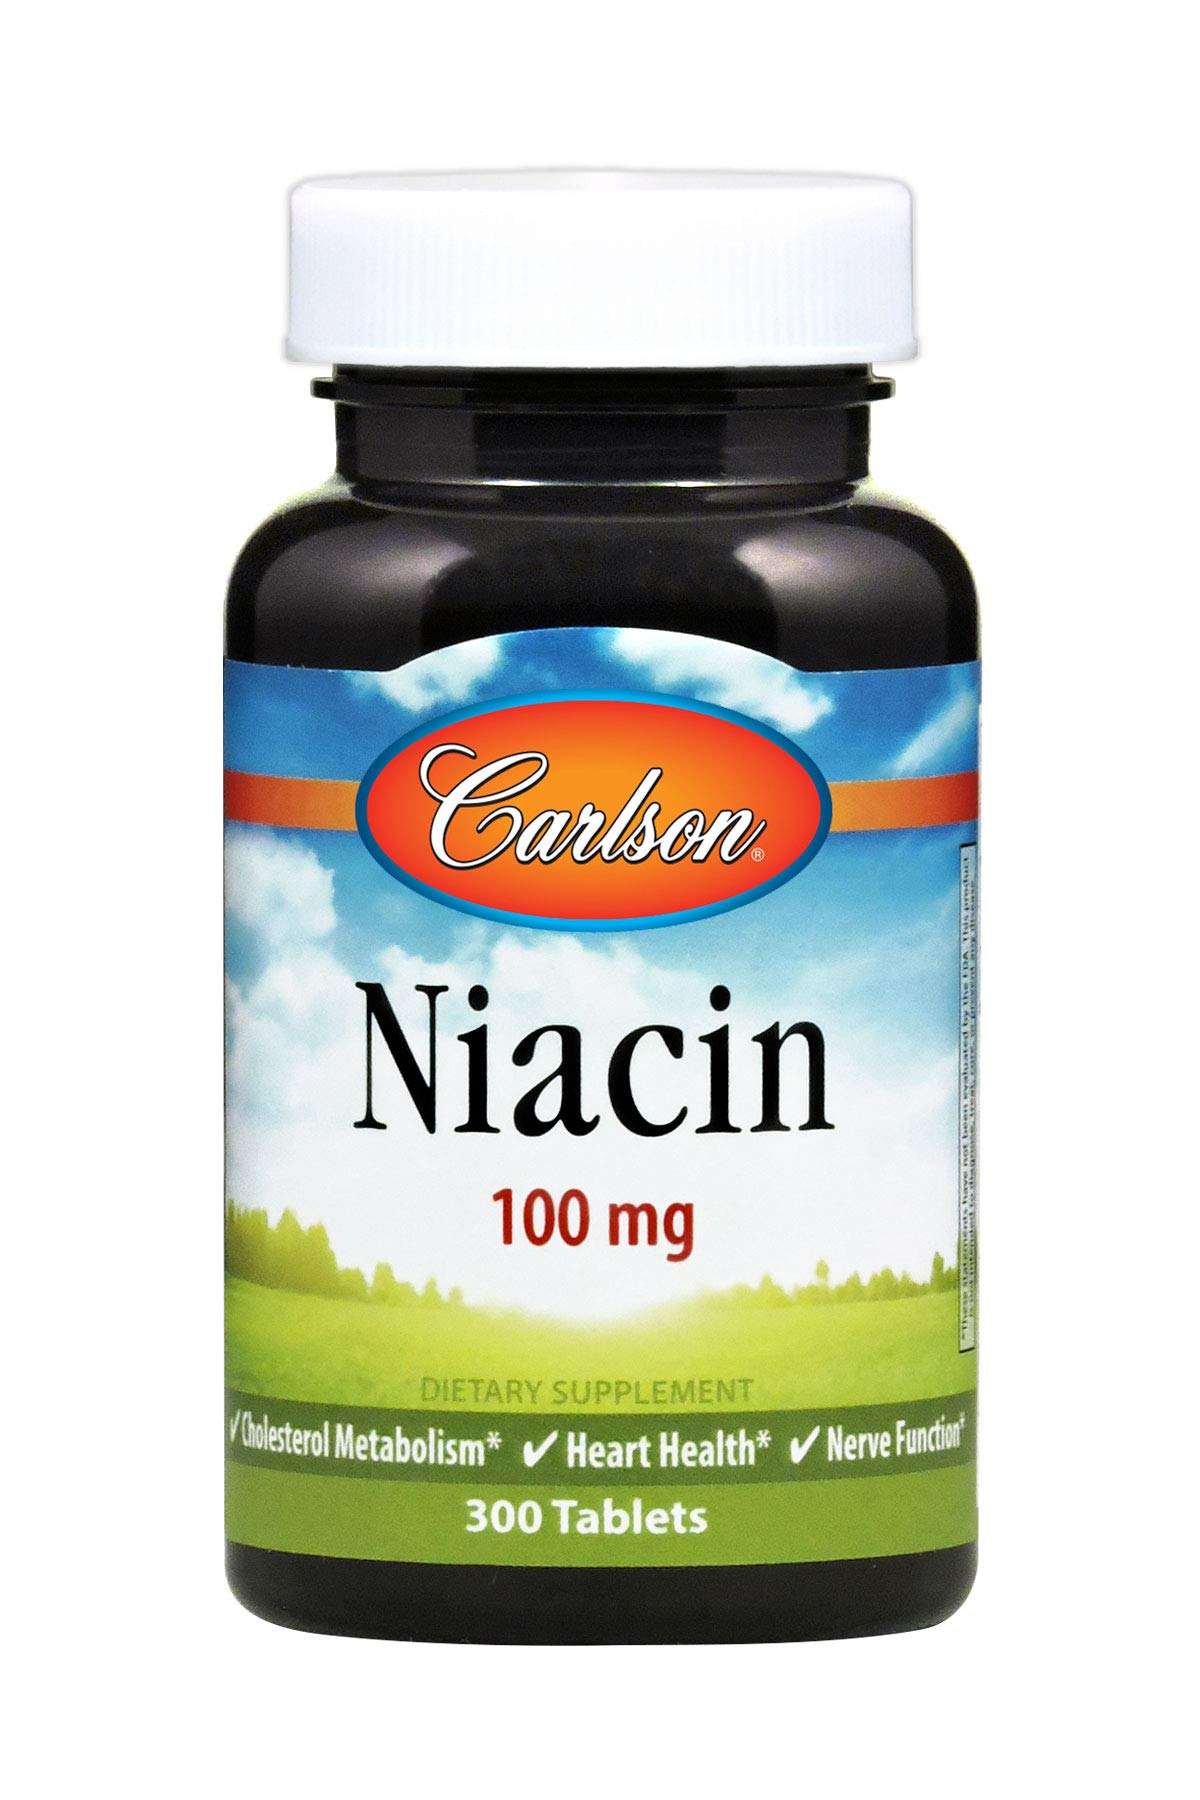 Carlson - Niacin 100 mg, Cholesterol Metabolism, Heart Health & Nerve Function, 300 Tablets